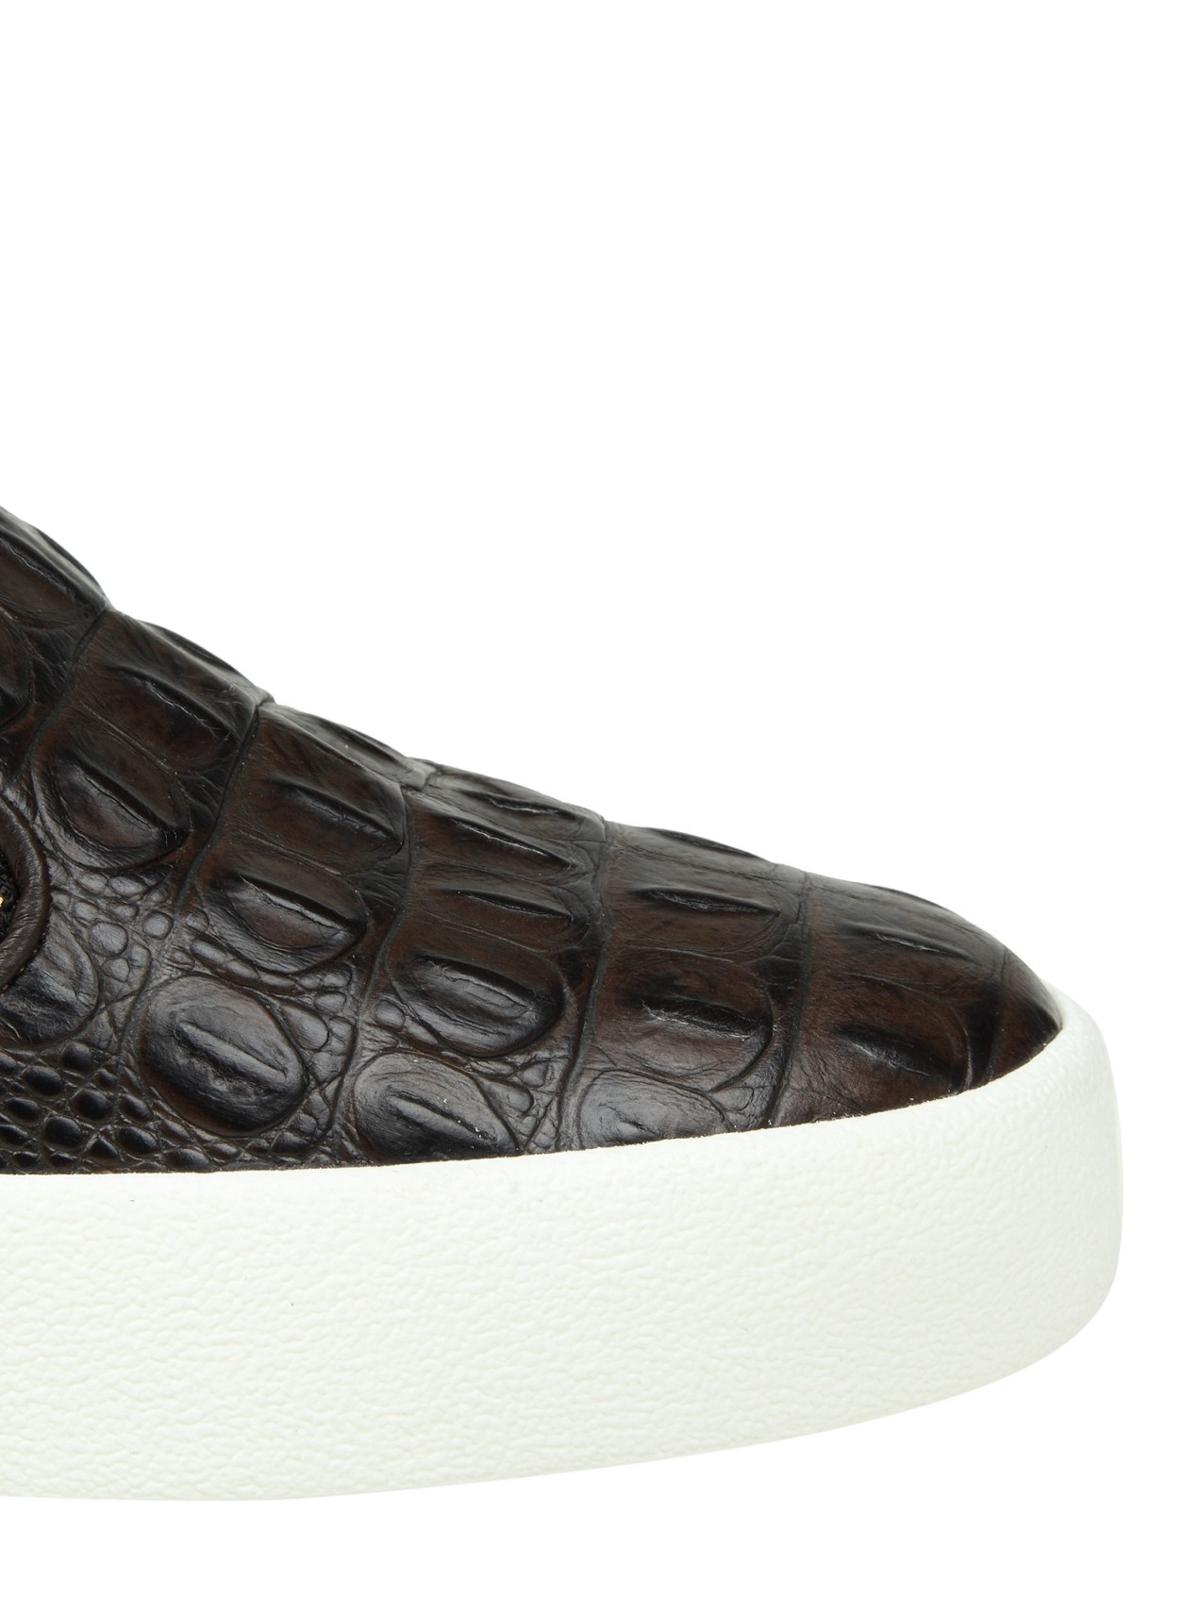 d2f4c4b545866 iKRIX GIUSEPPE ZANOTTI: trainers - May London croco print slip-ons